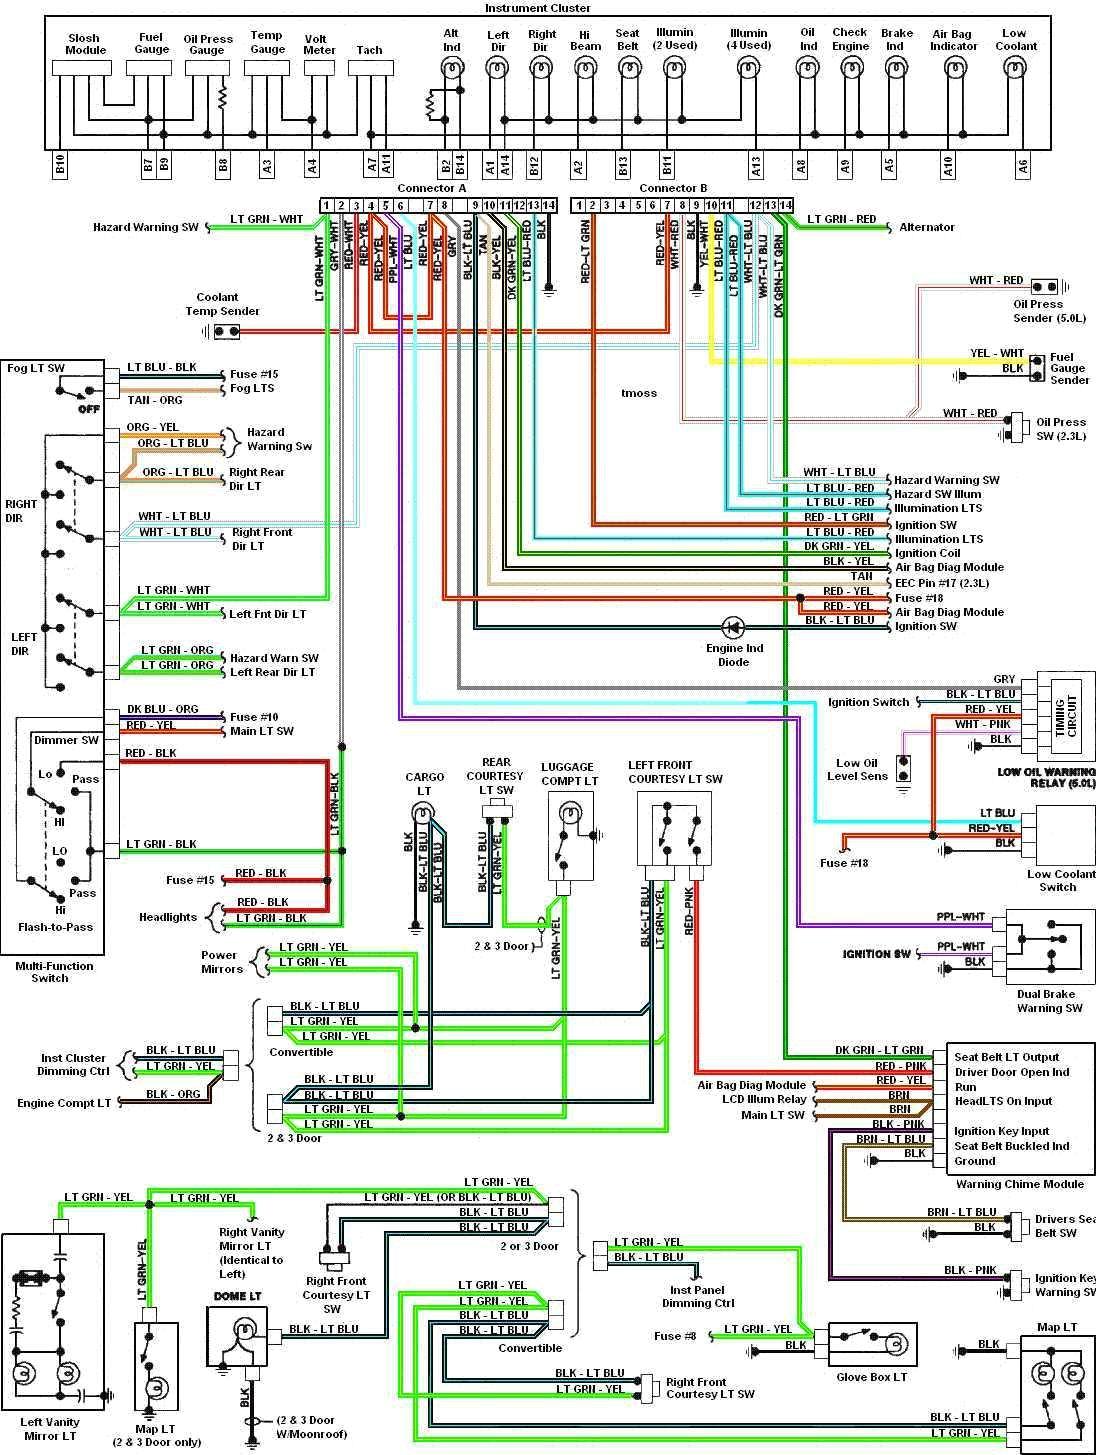 2008 Ford F150 Radio Wiring Diagram Templates Super Duty 2003 F250 - Ford F250 Stereo Wiring Diagram